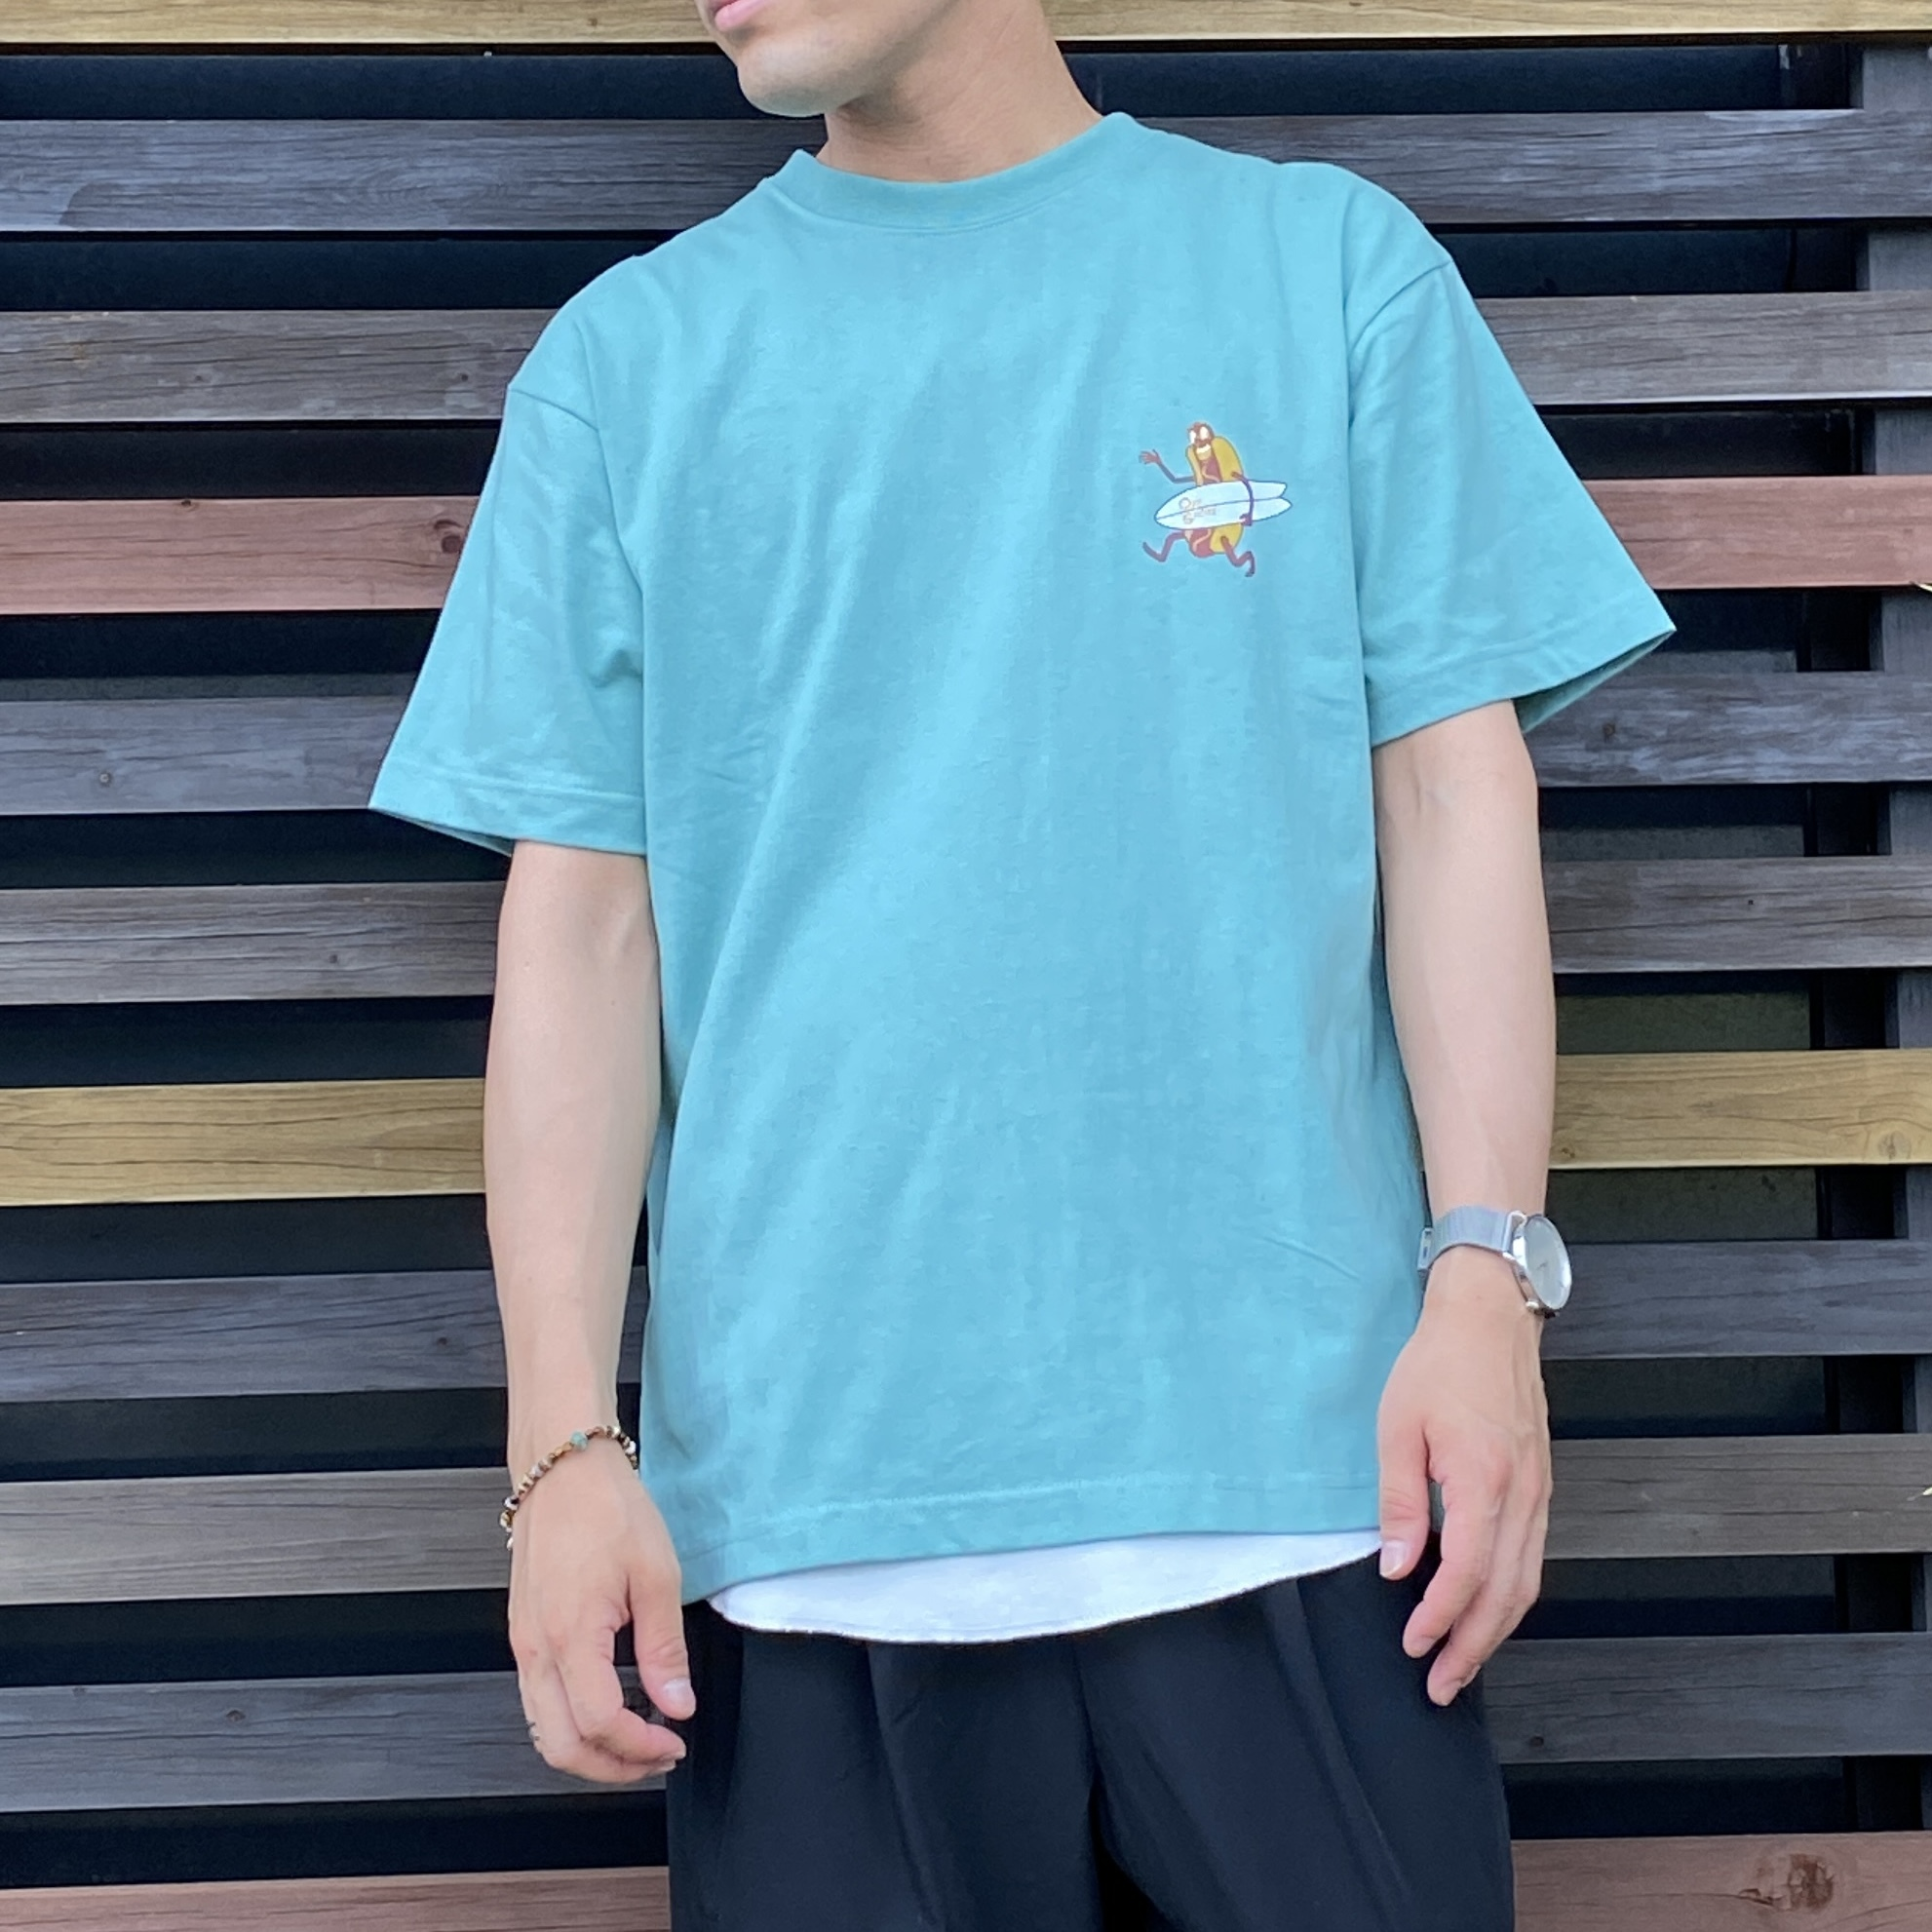 OFFSHORE/オフショア ホットドッグプリントTシャツ  OS21-2CS-008W